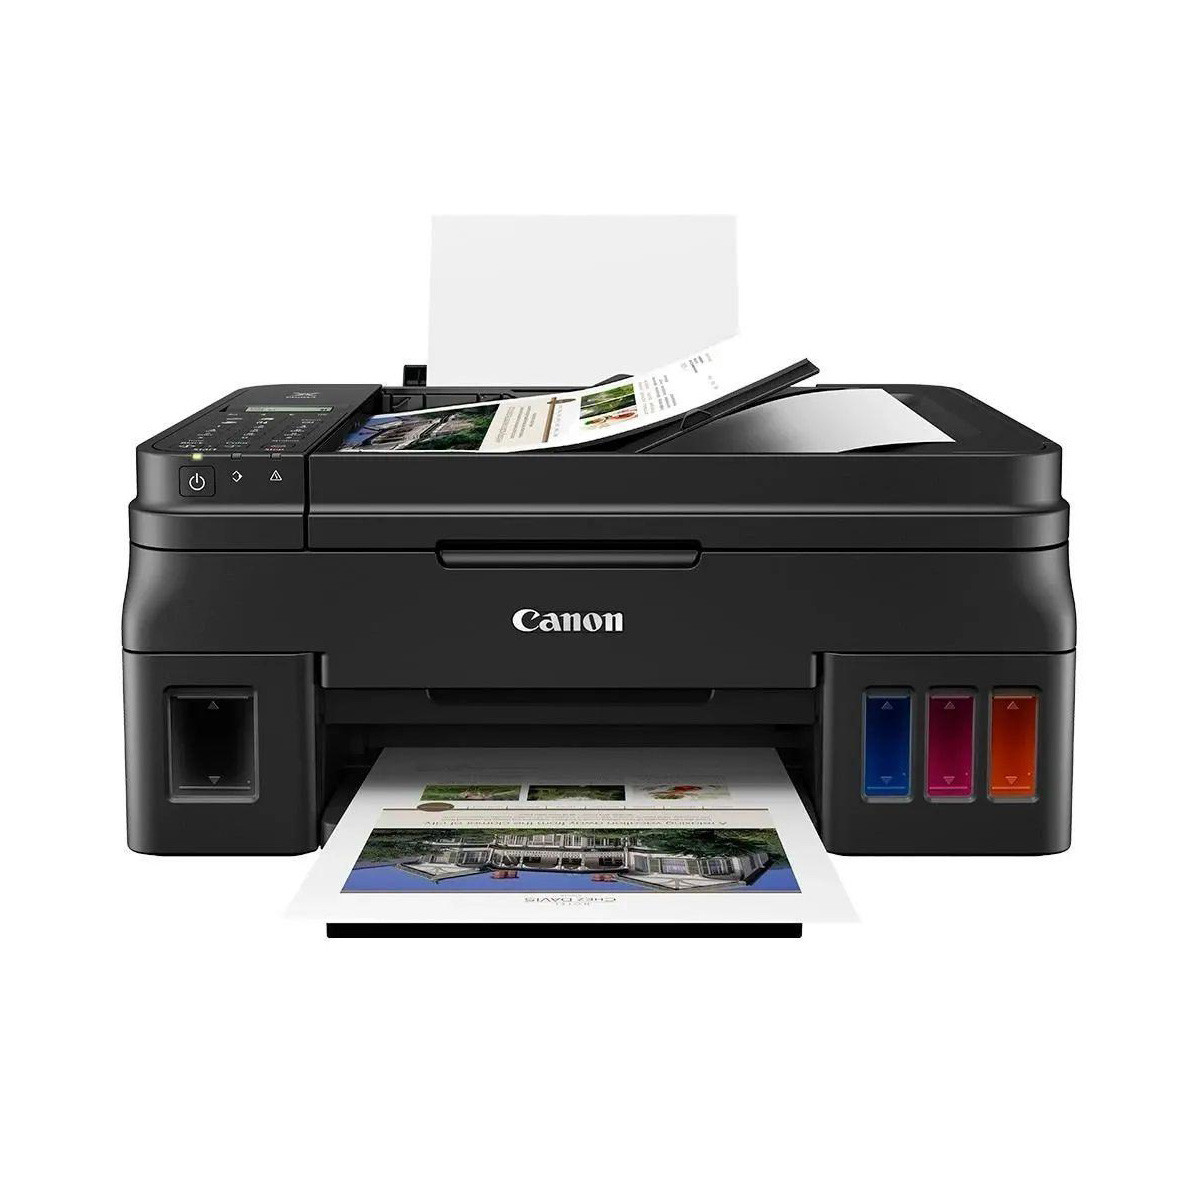 Impressora Canon Maxx Tinta G4111 G4110 | Multifuncional Tanque de Tinta com Wireless e ADF